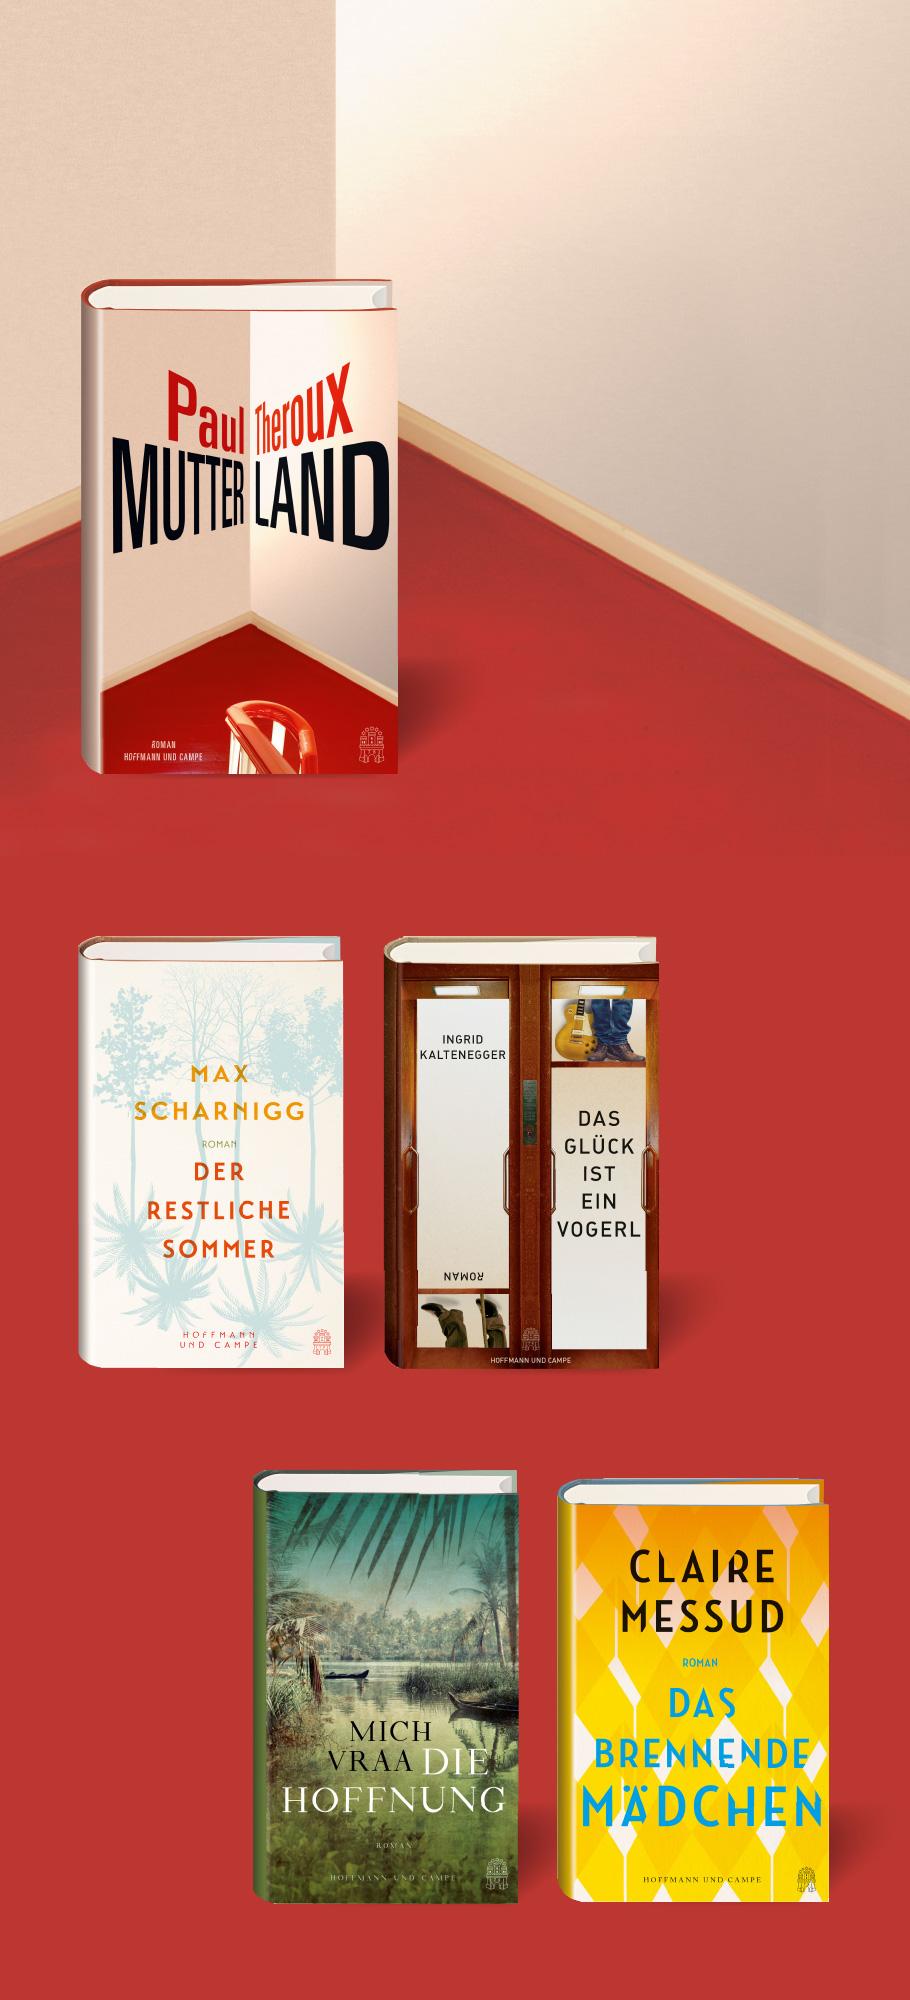 Buchcover Hoffman und Campe, Atlantik